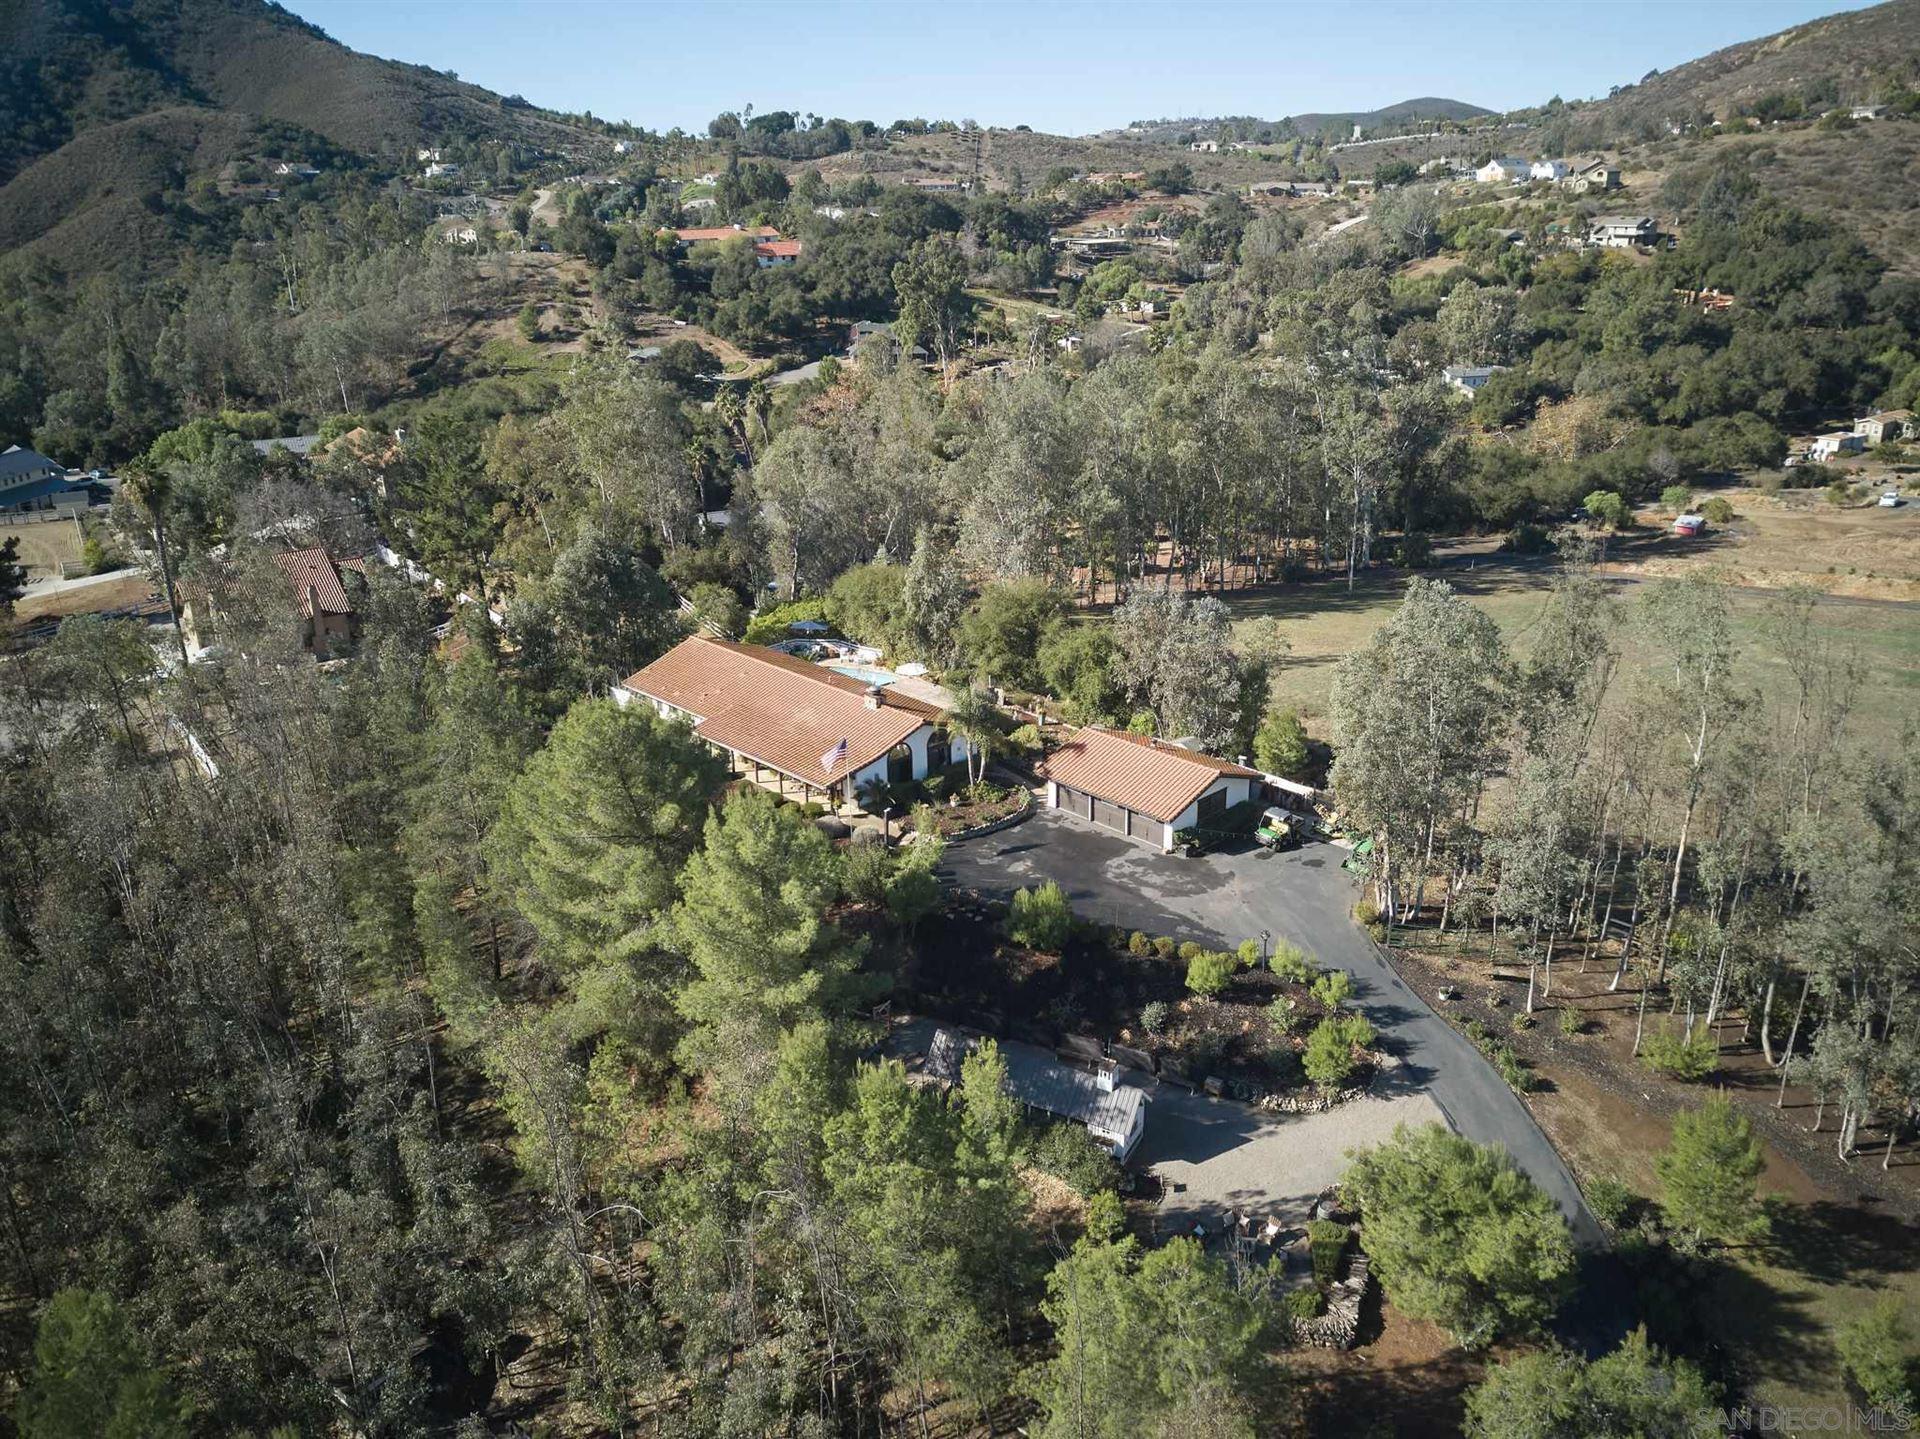 Photo for 7980 Harmony Grove Rd, Escondido, CA 92029 (MLS # 210010045)